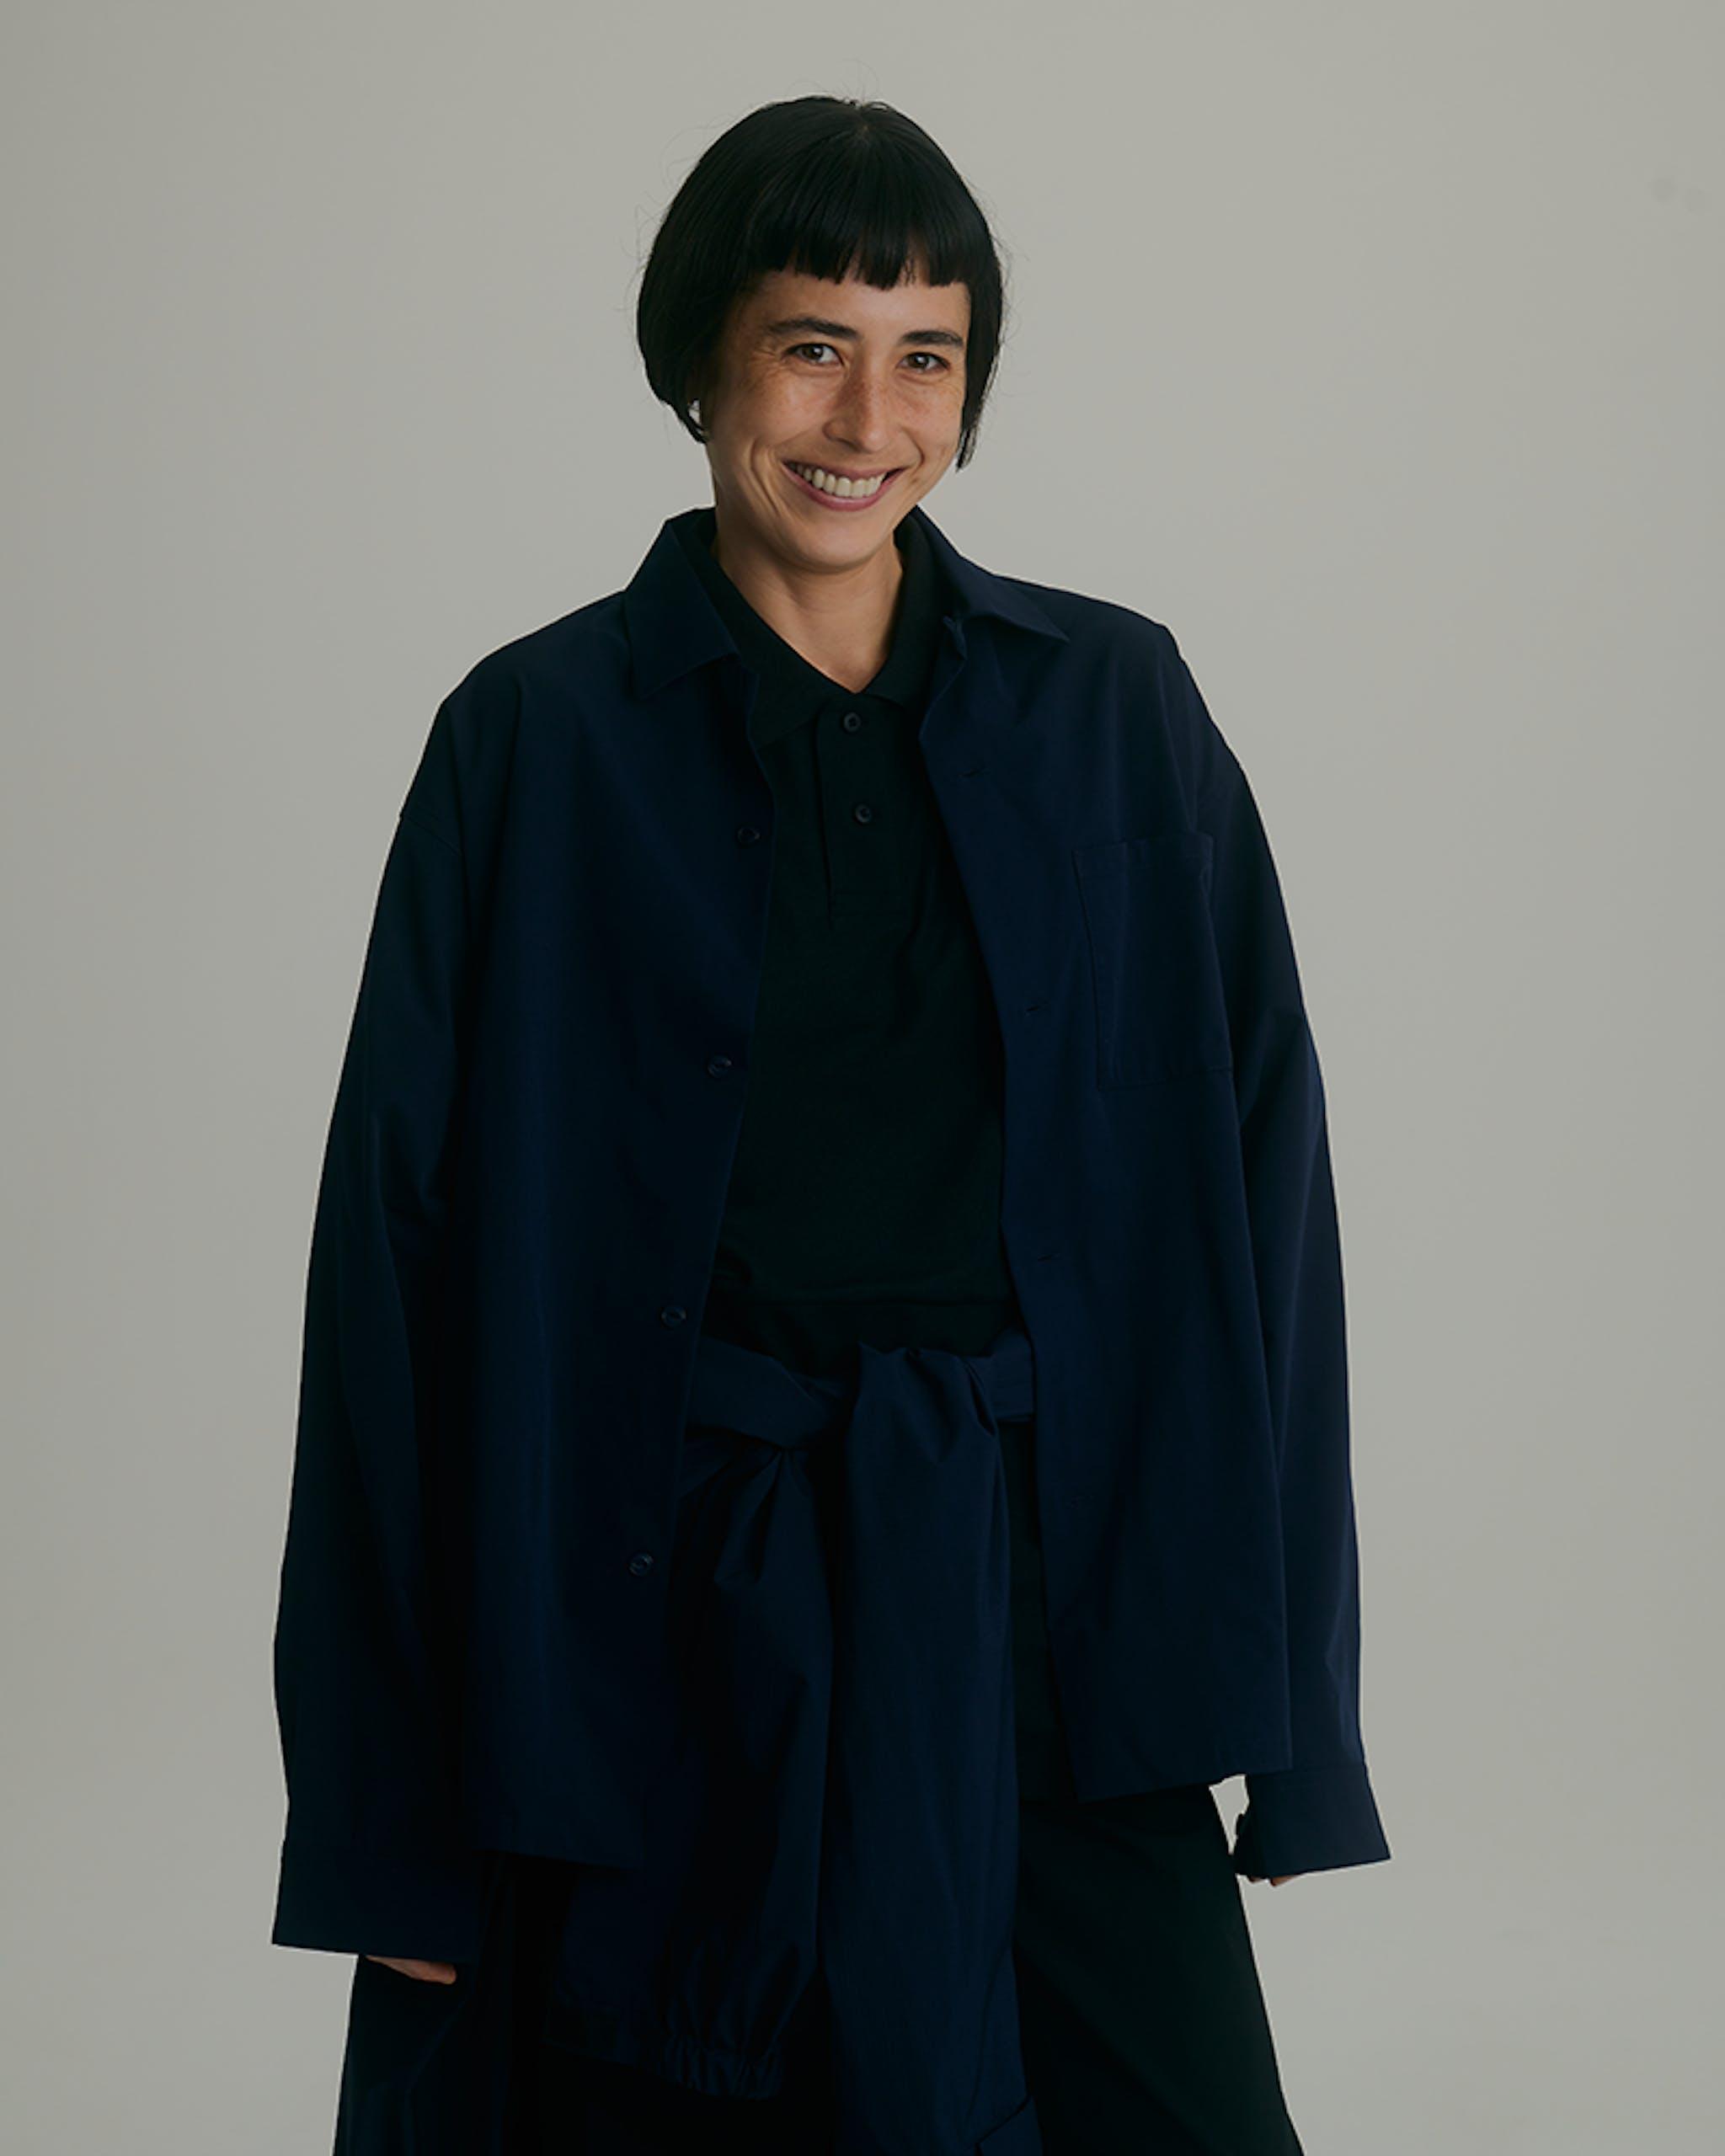 POLO SHIRT ¥4,290(税込) / SHIRT ¥7,590(税込) / HOODY ¥10,890(税込) / PANTS ¥8,690(税込)